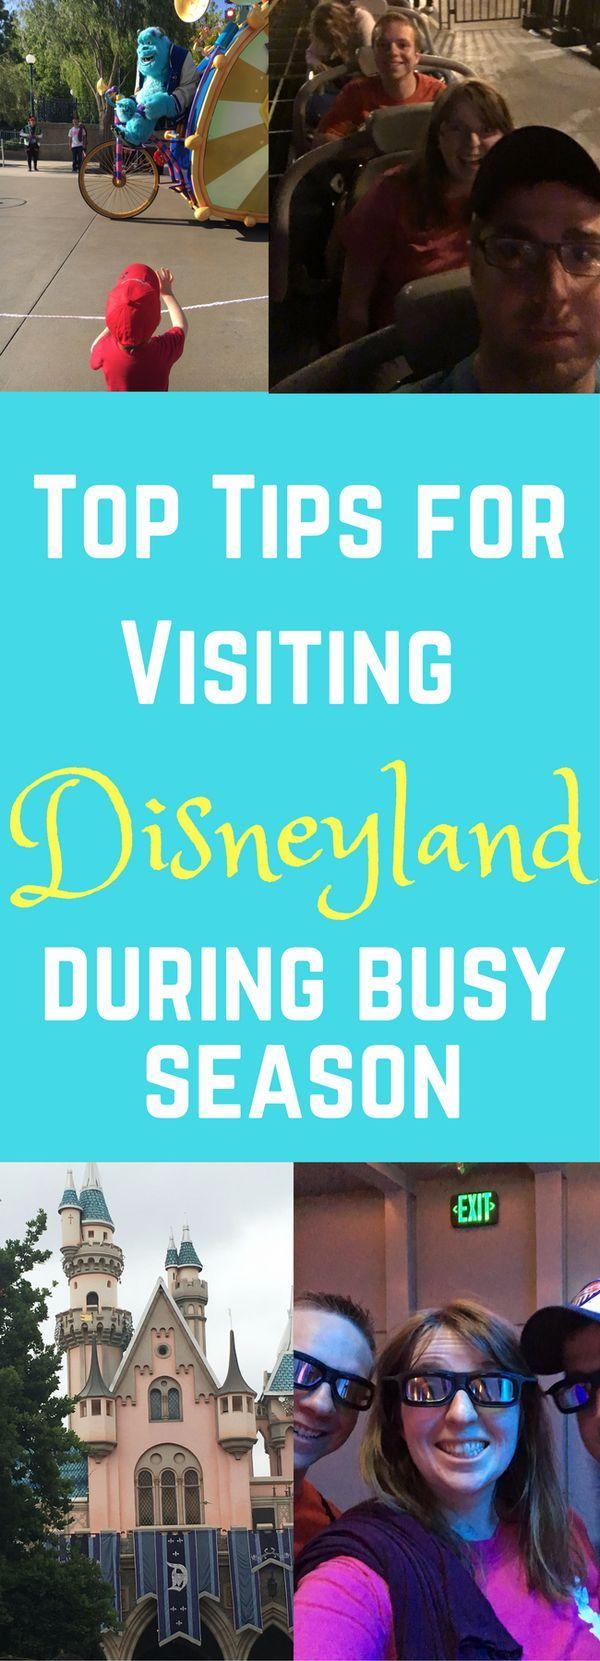 Disneyland / Disneyland Tips / Tips for Visiting Disneyland / Disneyland During the Summer / Best times to visit disneyland / disneyland advice / disneyland secrets / disneyland california / disneyland | tips, tricks & secrets